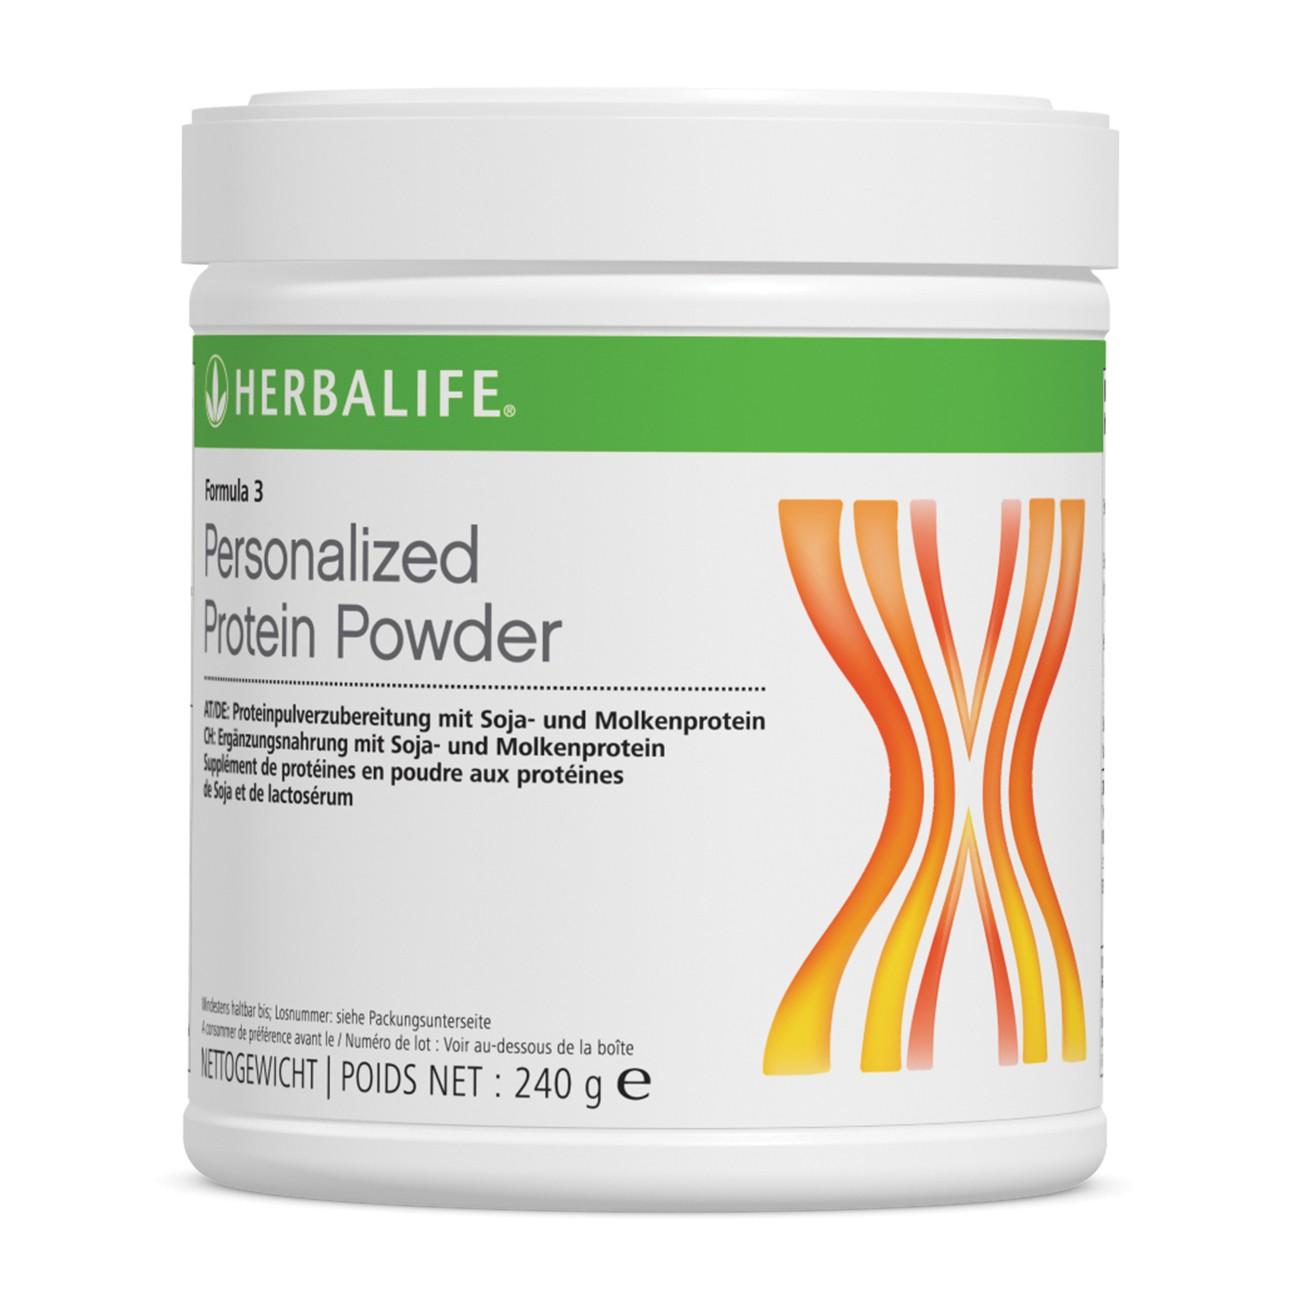 Herbalife Formula 3 Personalized Protein Powder 240 g